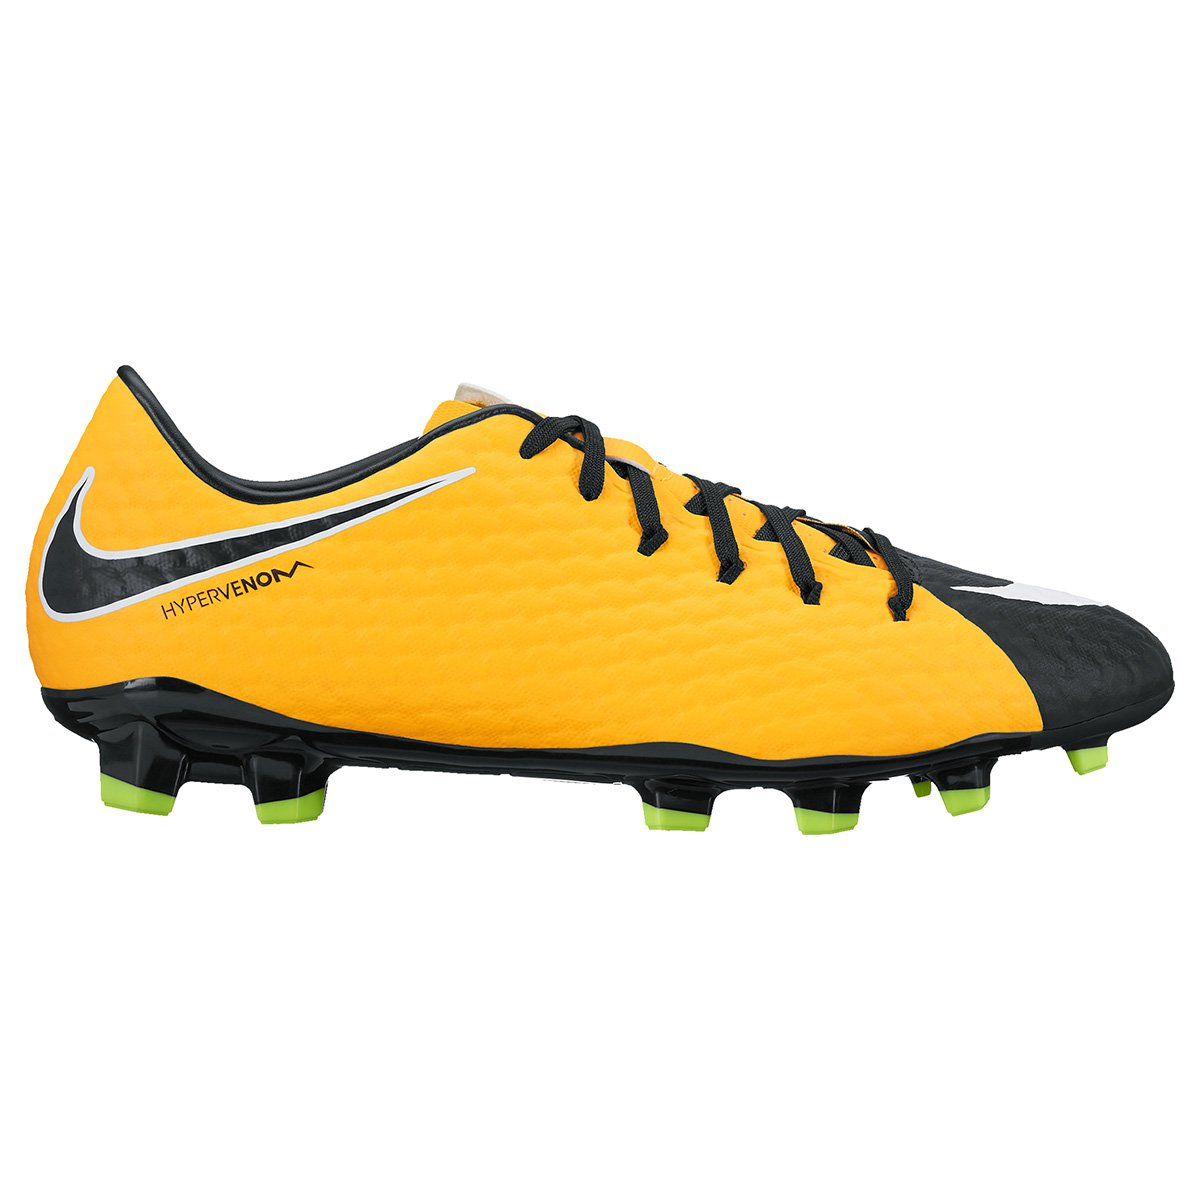 8b24159faf Chuteira Campo Nike Hypervenom Phelon 3 FG - Laranja e Preto